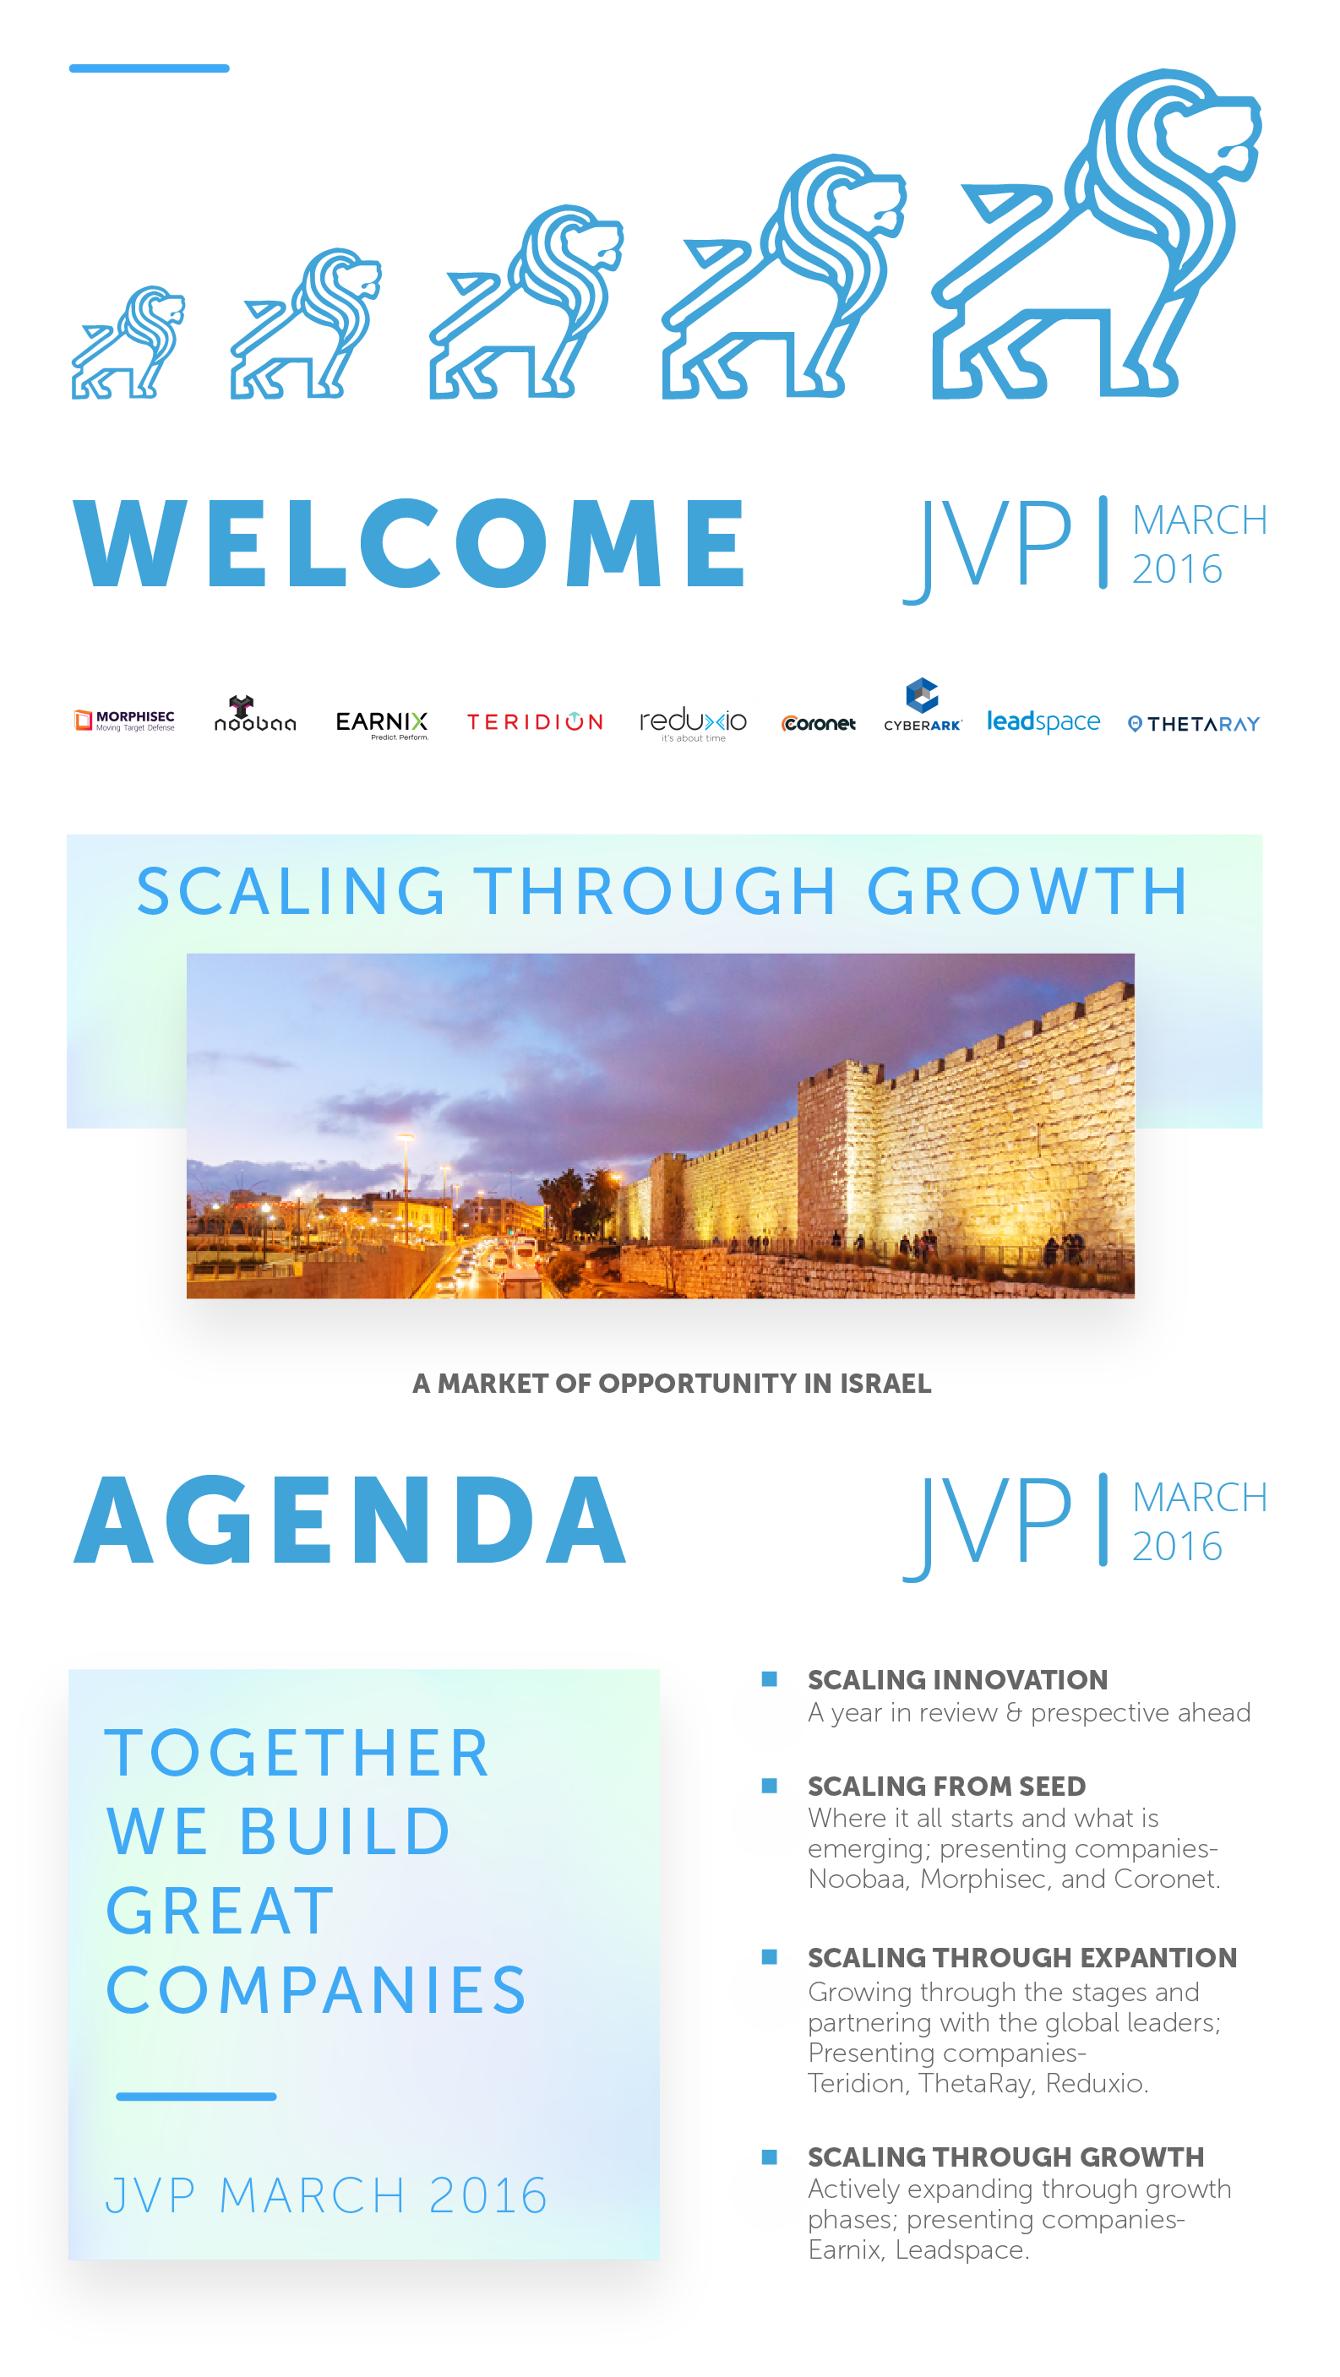 JVP - Jerusalem Venture Partners - Einav David